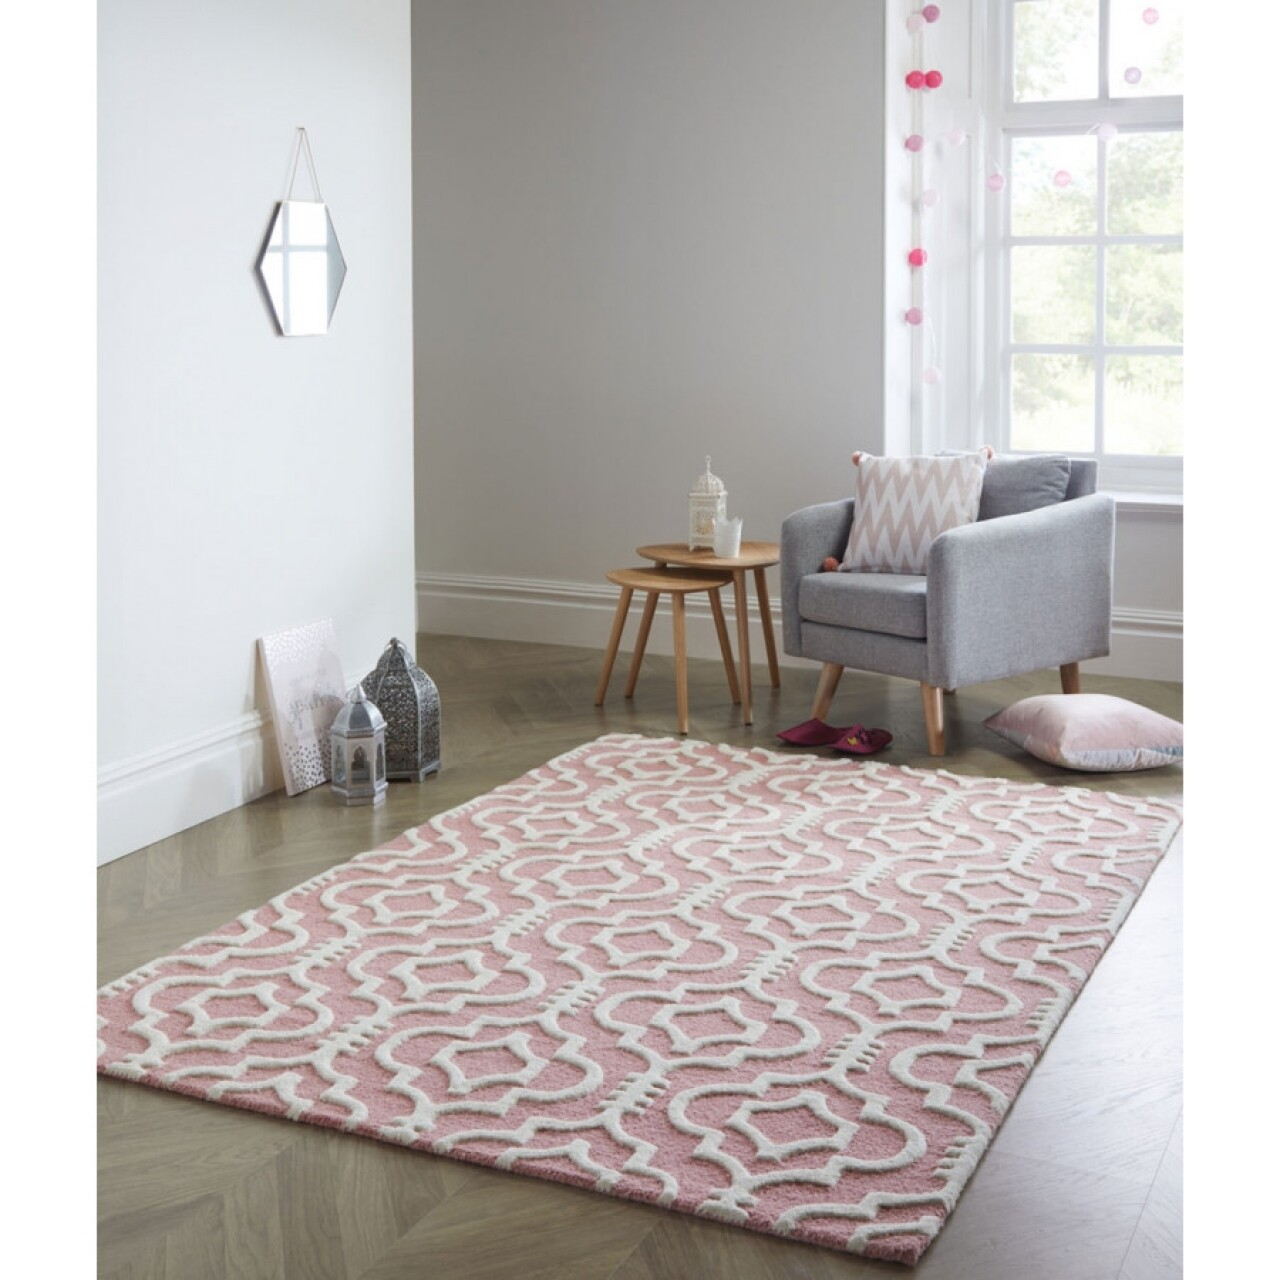 Covor Moorish Melilla Pink, Flair Rugs, 160 x 230 cm, 100% lana, roz/alb